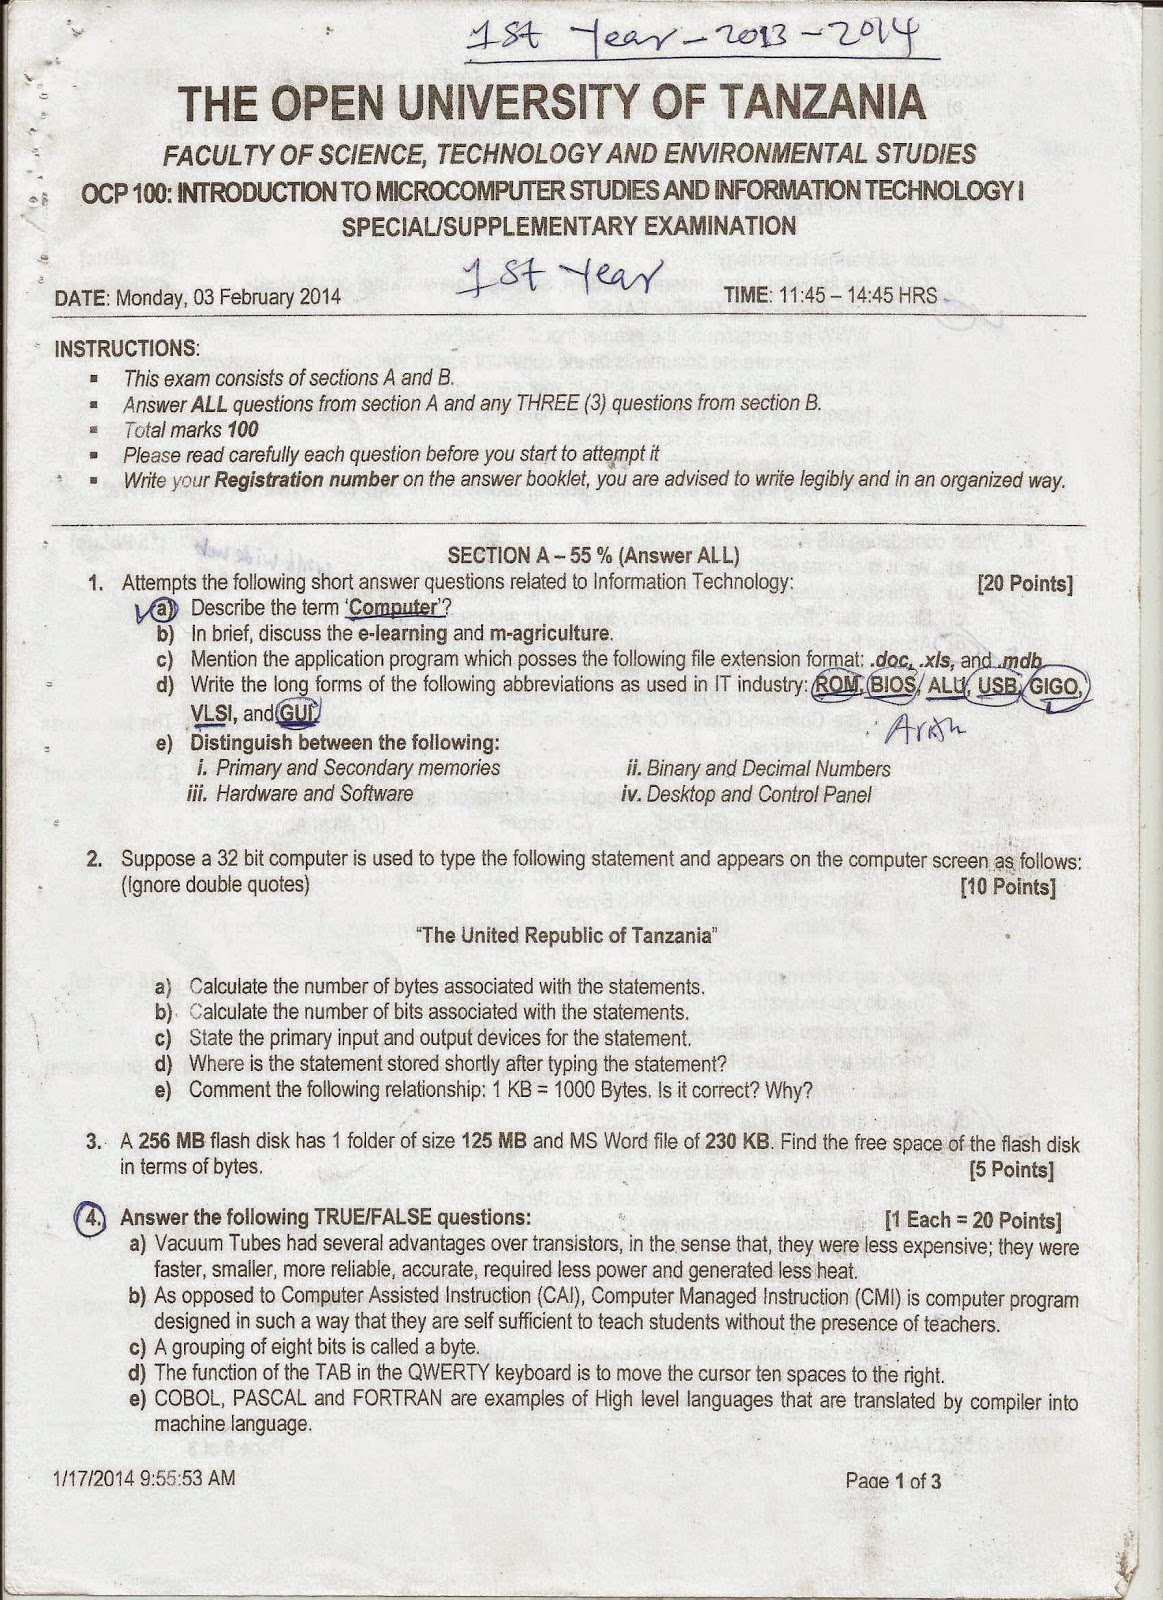 JAPHET MASATU BLOG: OCP 100 : INTRODUCTION TO